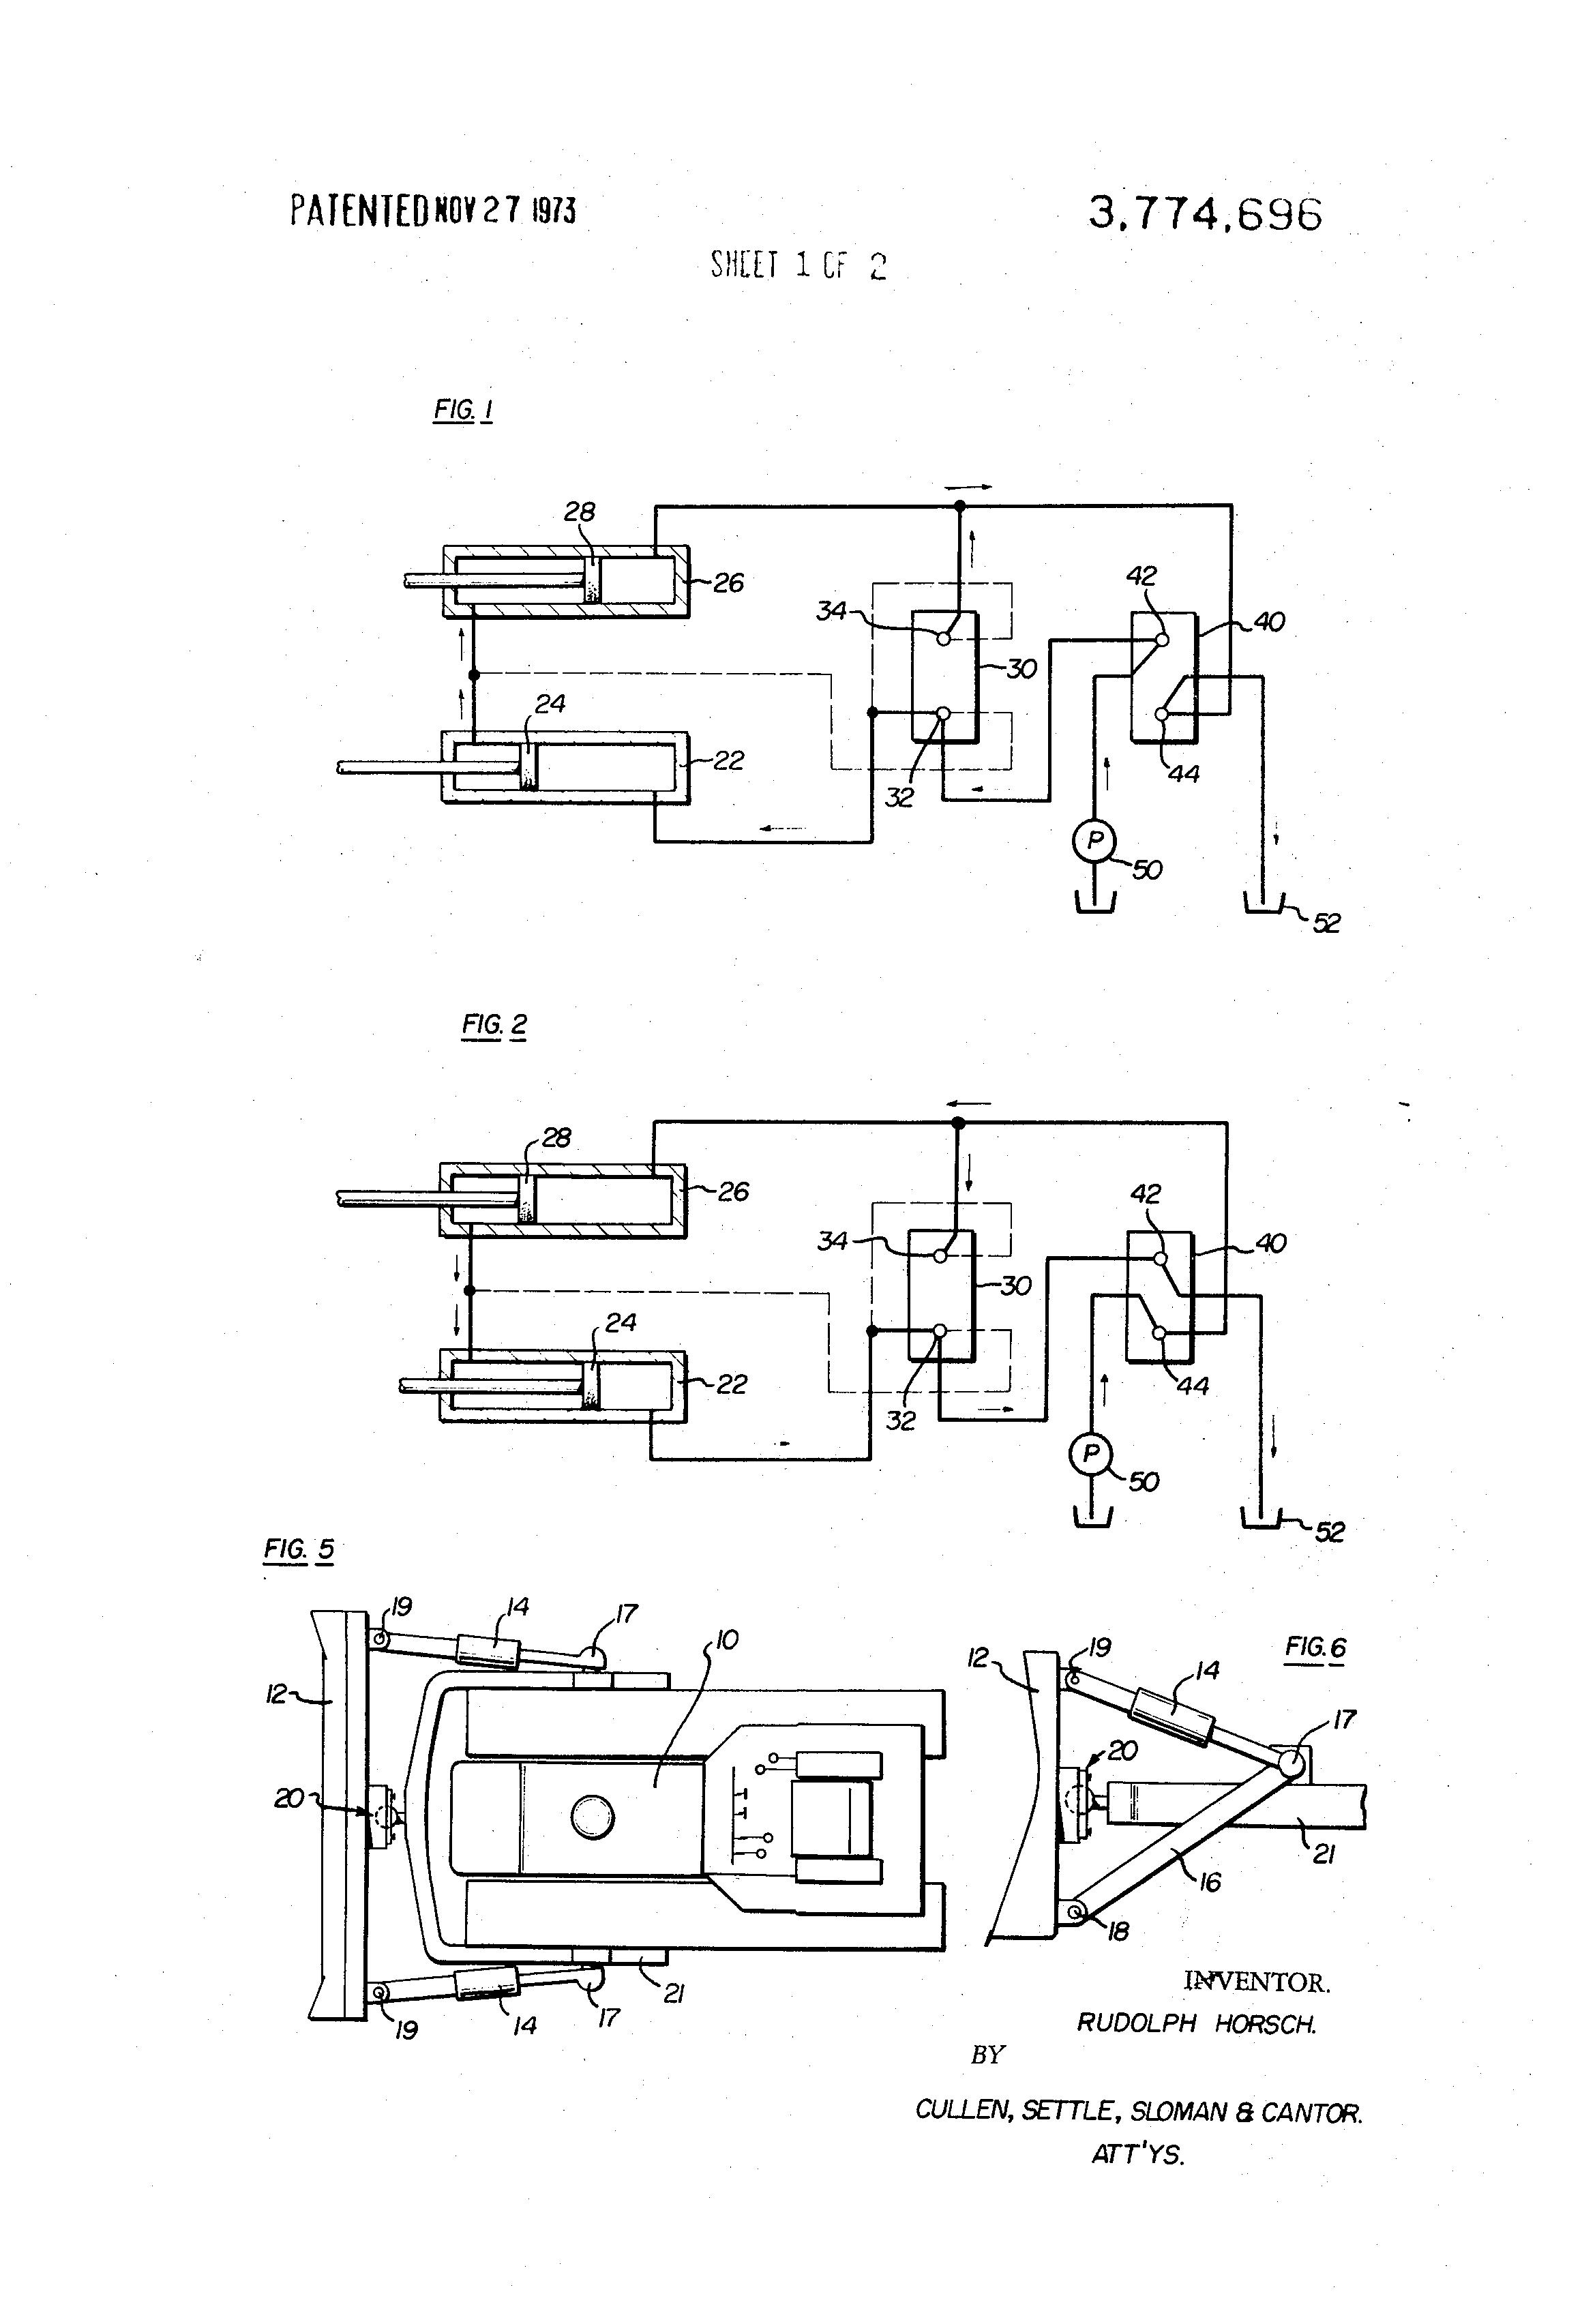 Dozer Hydraulic System Schematic Modern Design Of Wiring Diagram Basic Simple Brevet Us3774696 Pitch Tilt Circuits For Blades Rh Google Dj Aircraft Systems